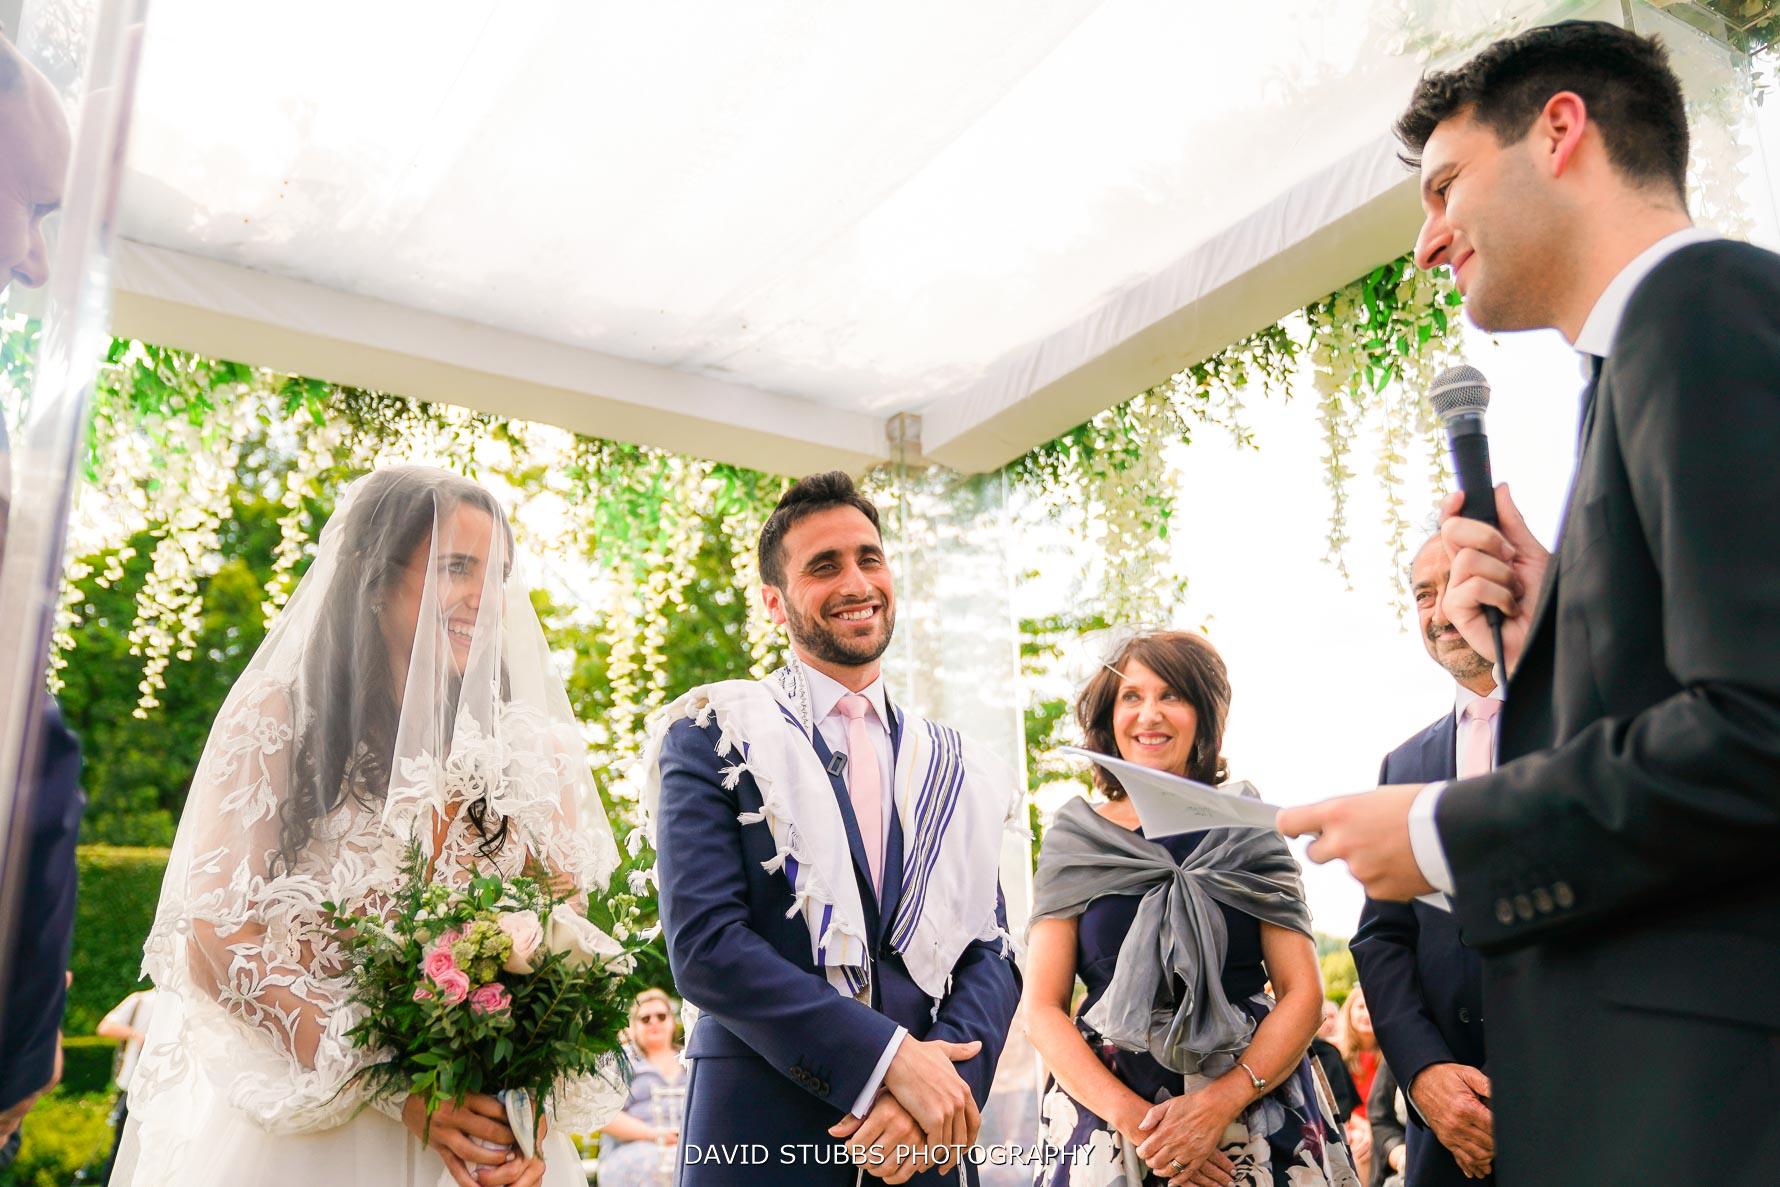 all the family enjoying the wedding ceremony